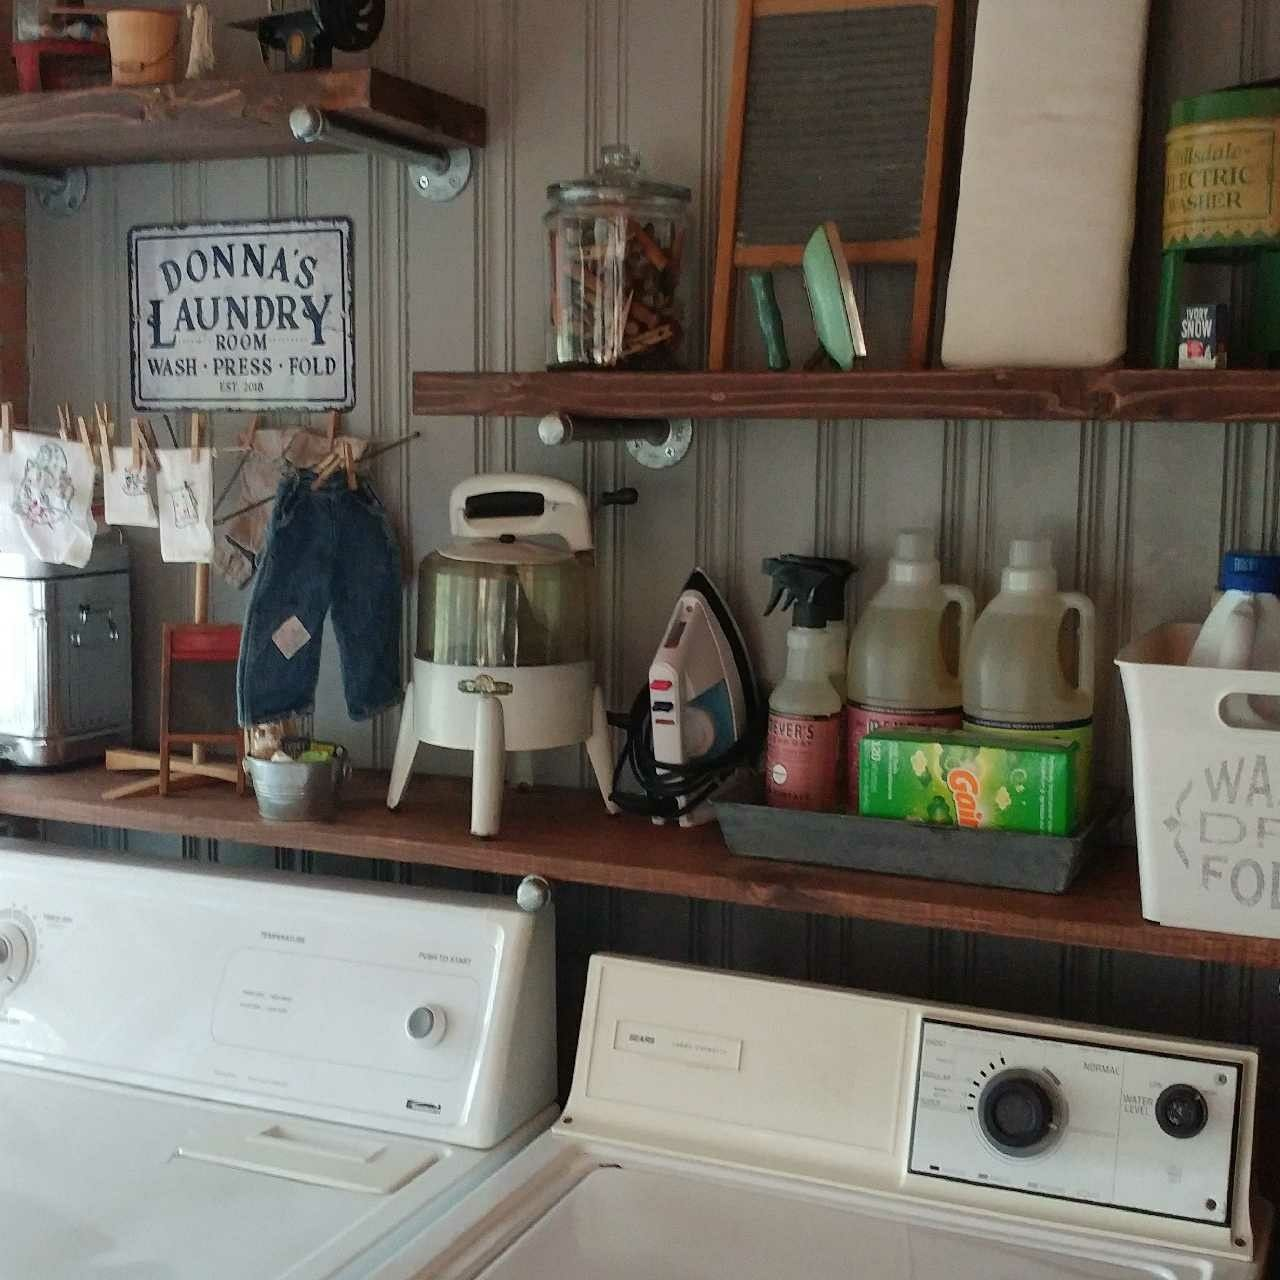 My New Sunroom Laundry Room Vintage Laundry Room Decor Primitive Laundry Rooms Vintage Laundry Room